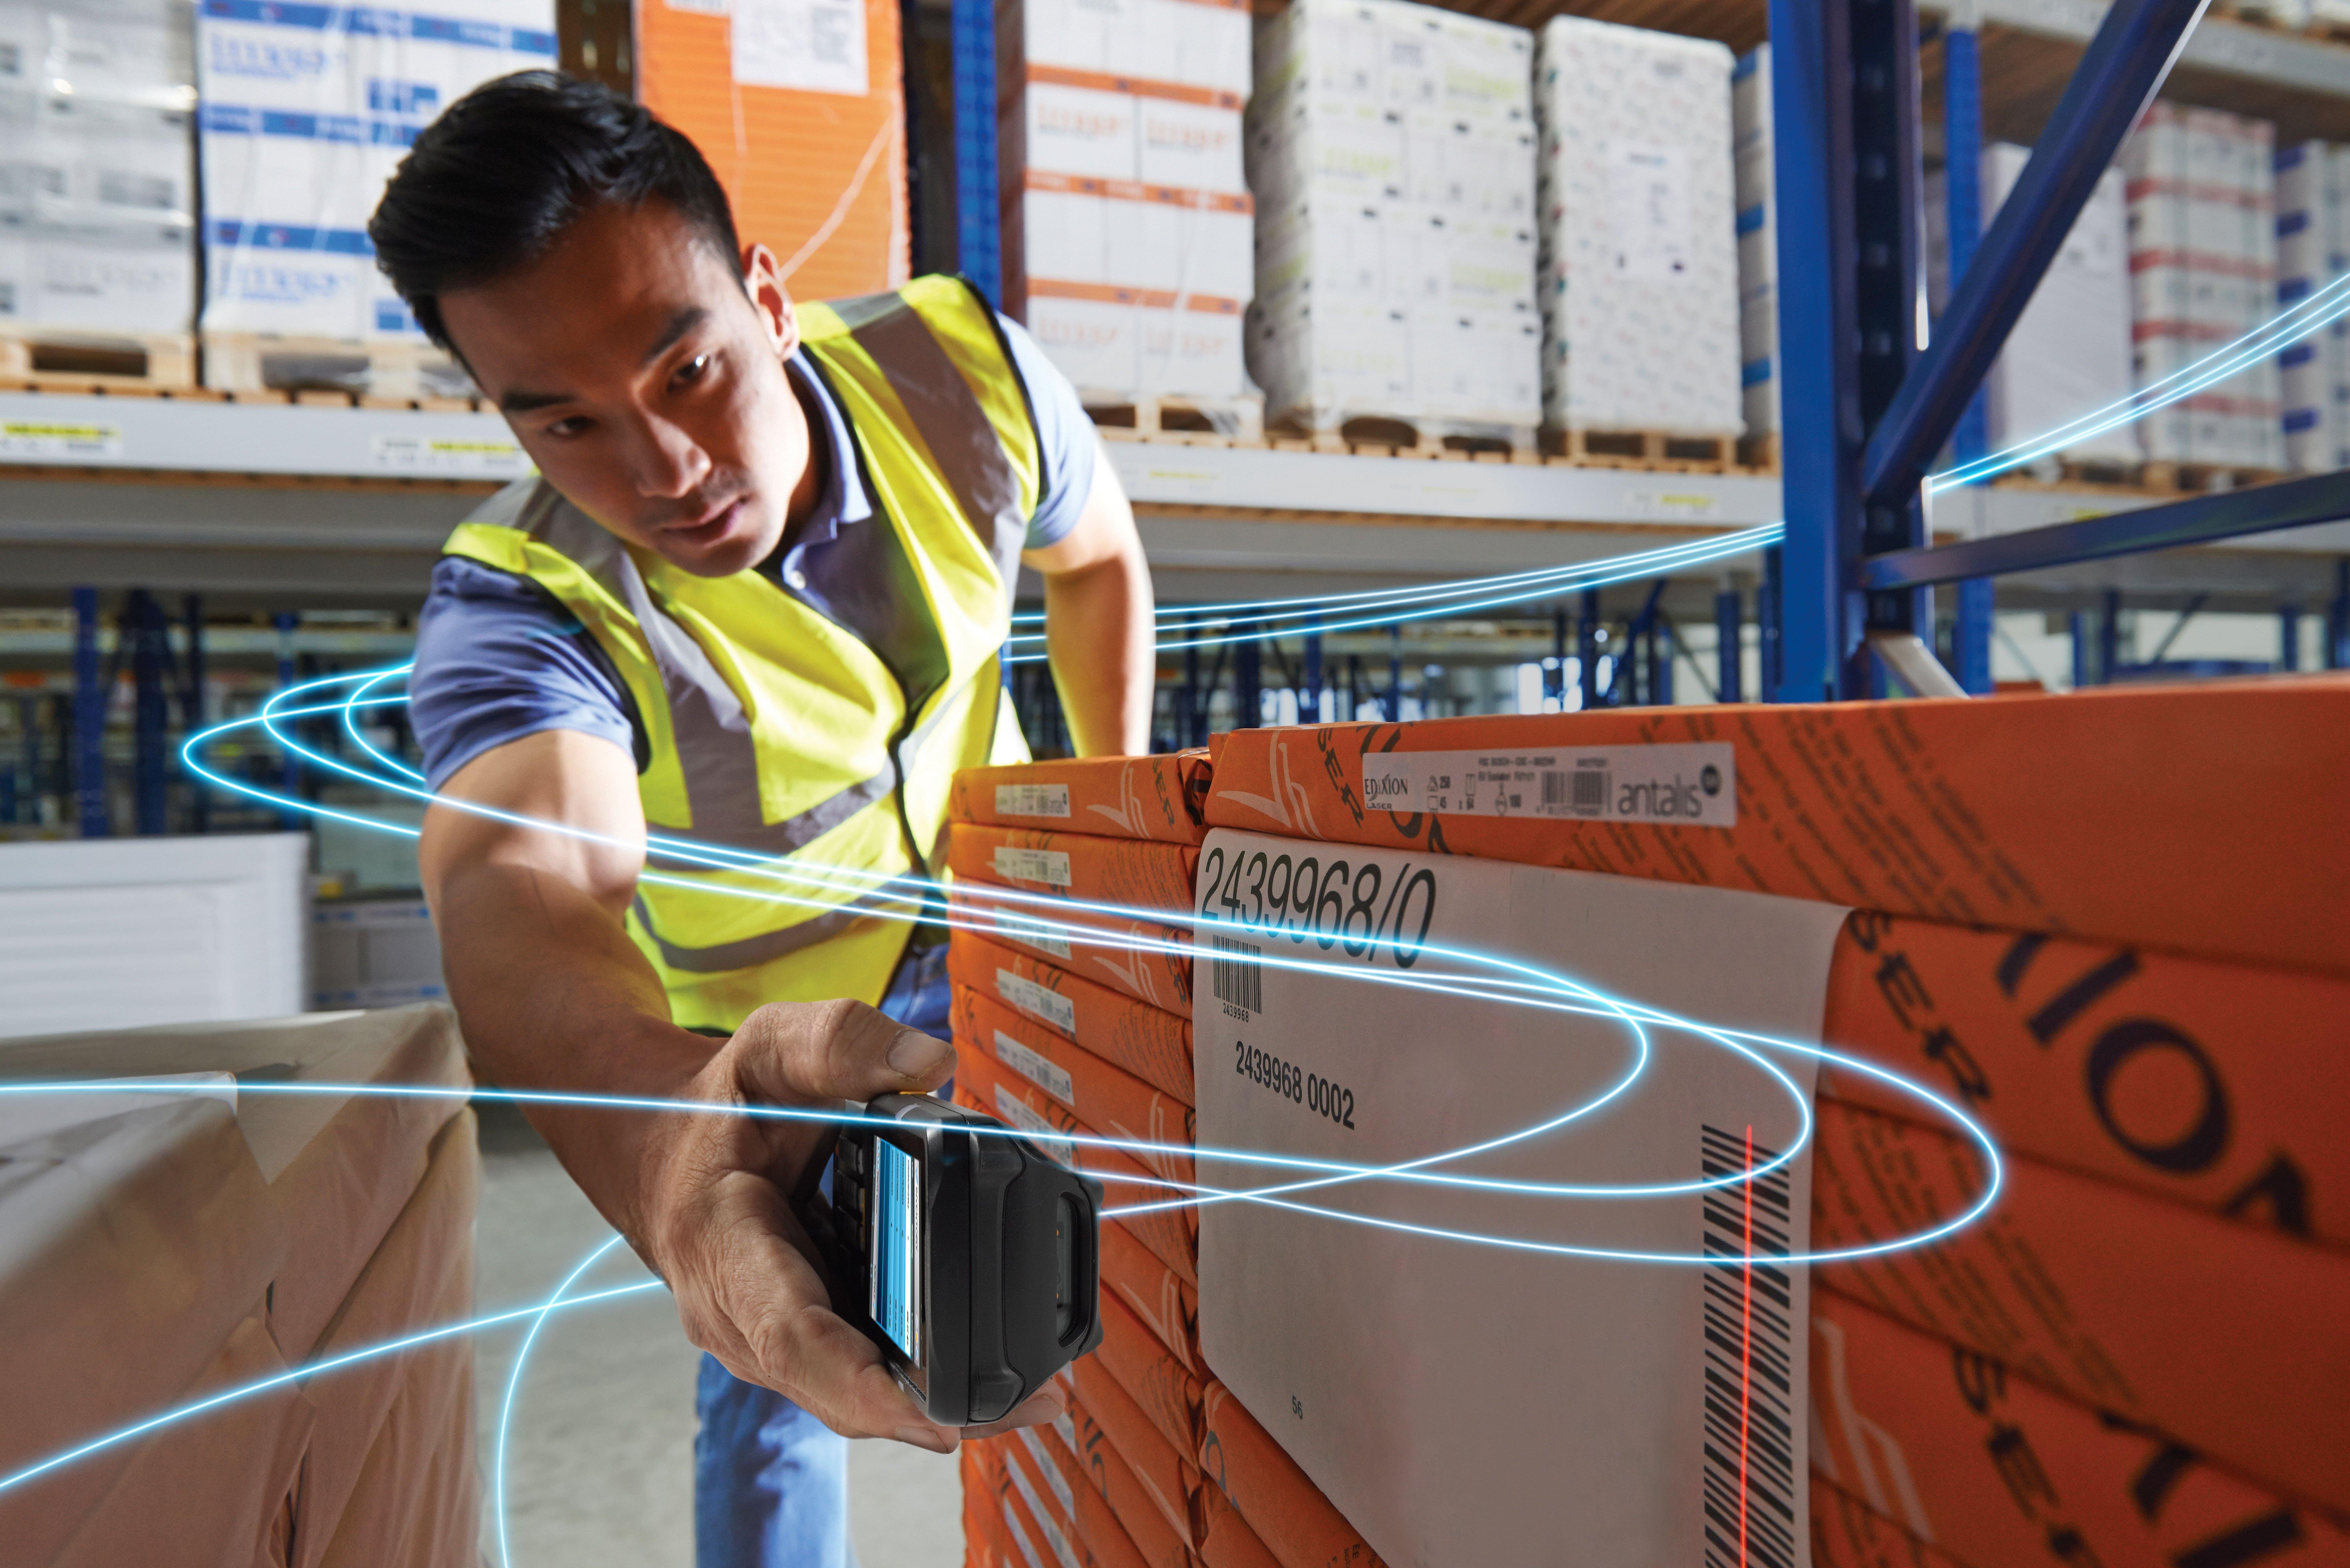 brand-graphic-overlay-data-flow-mc3300-45-degree-scan-warehouse-2